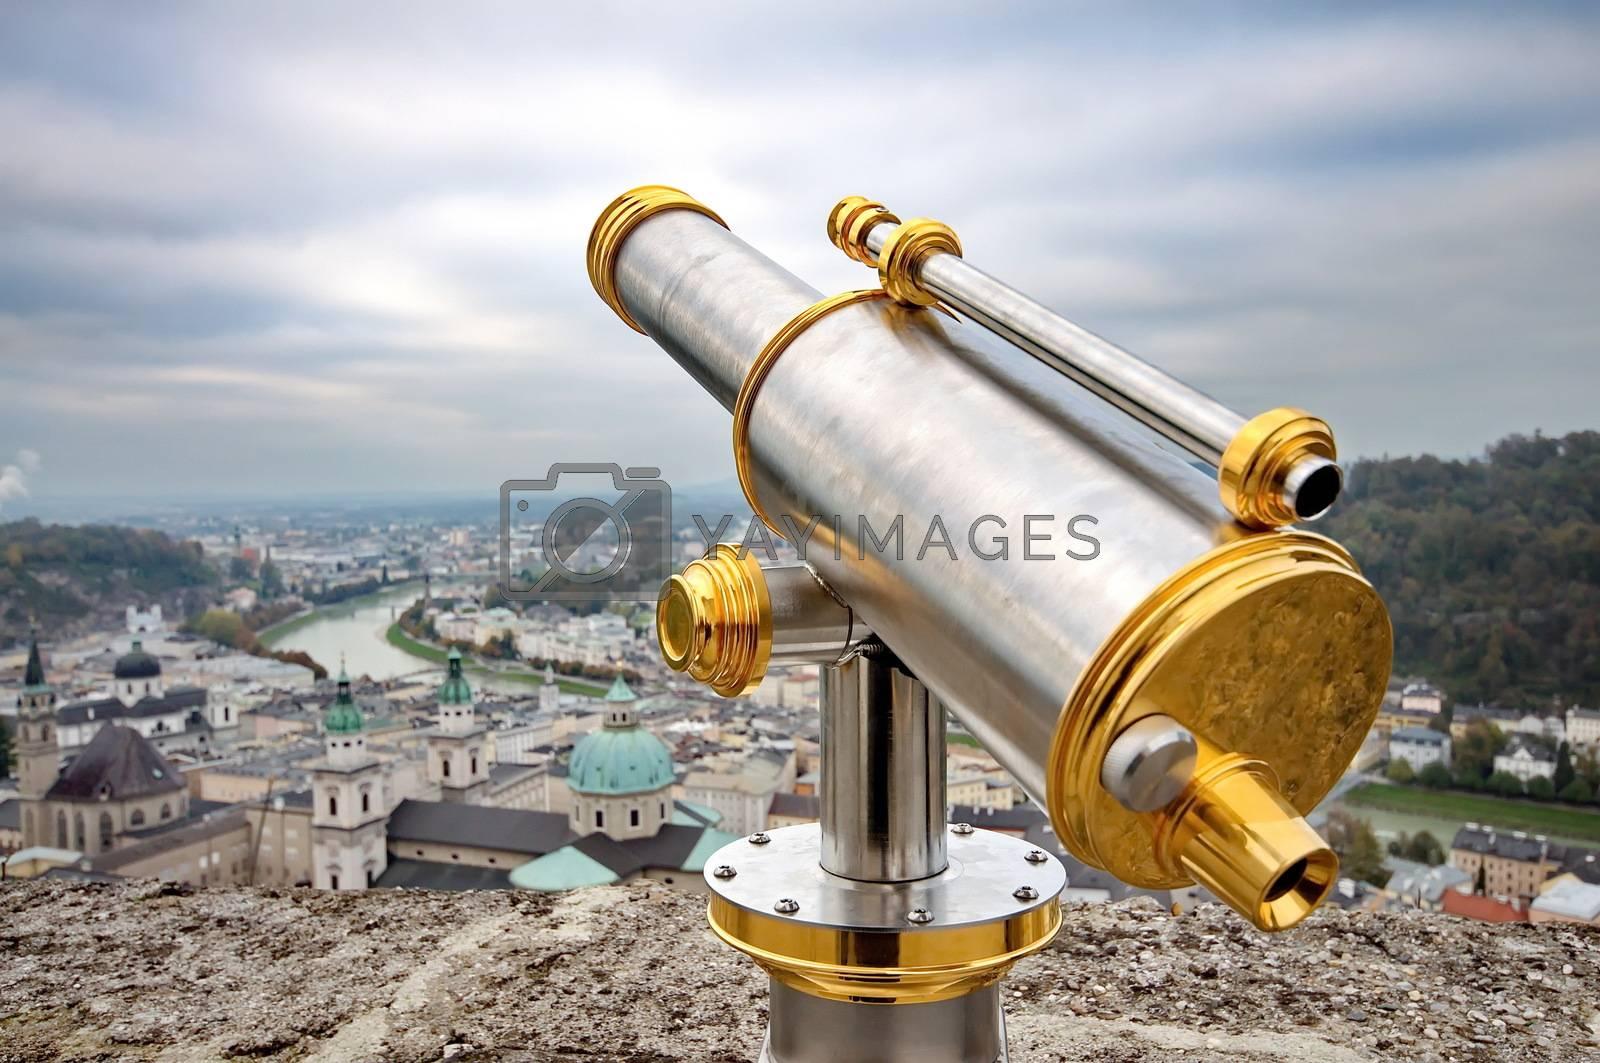 Royalty free image of Tourist binoculars in Salzburg, Austira by anderm